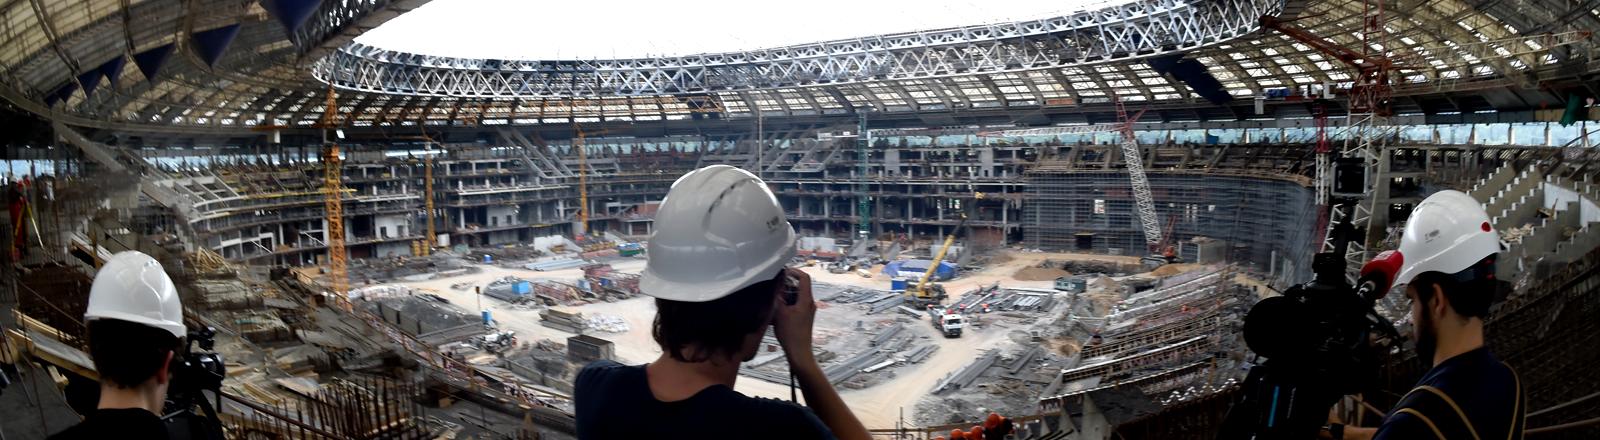 Die Baustelle im Luschniki-Park in Moskau im Juli 2015